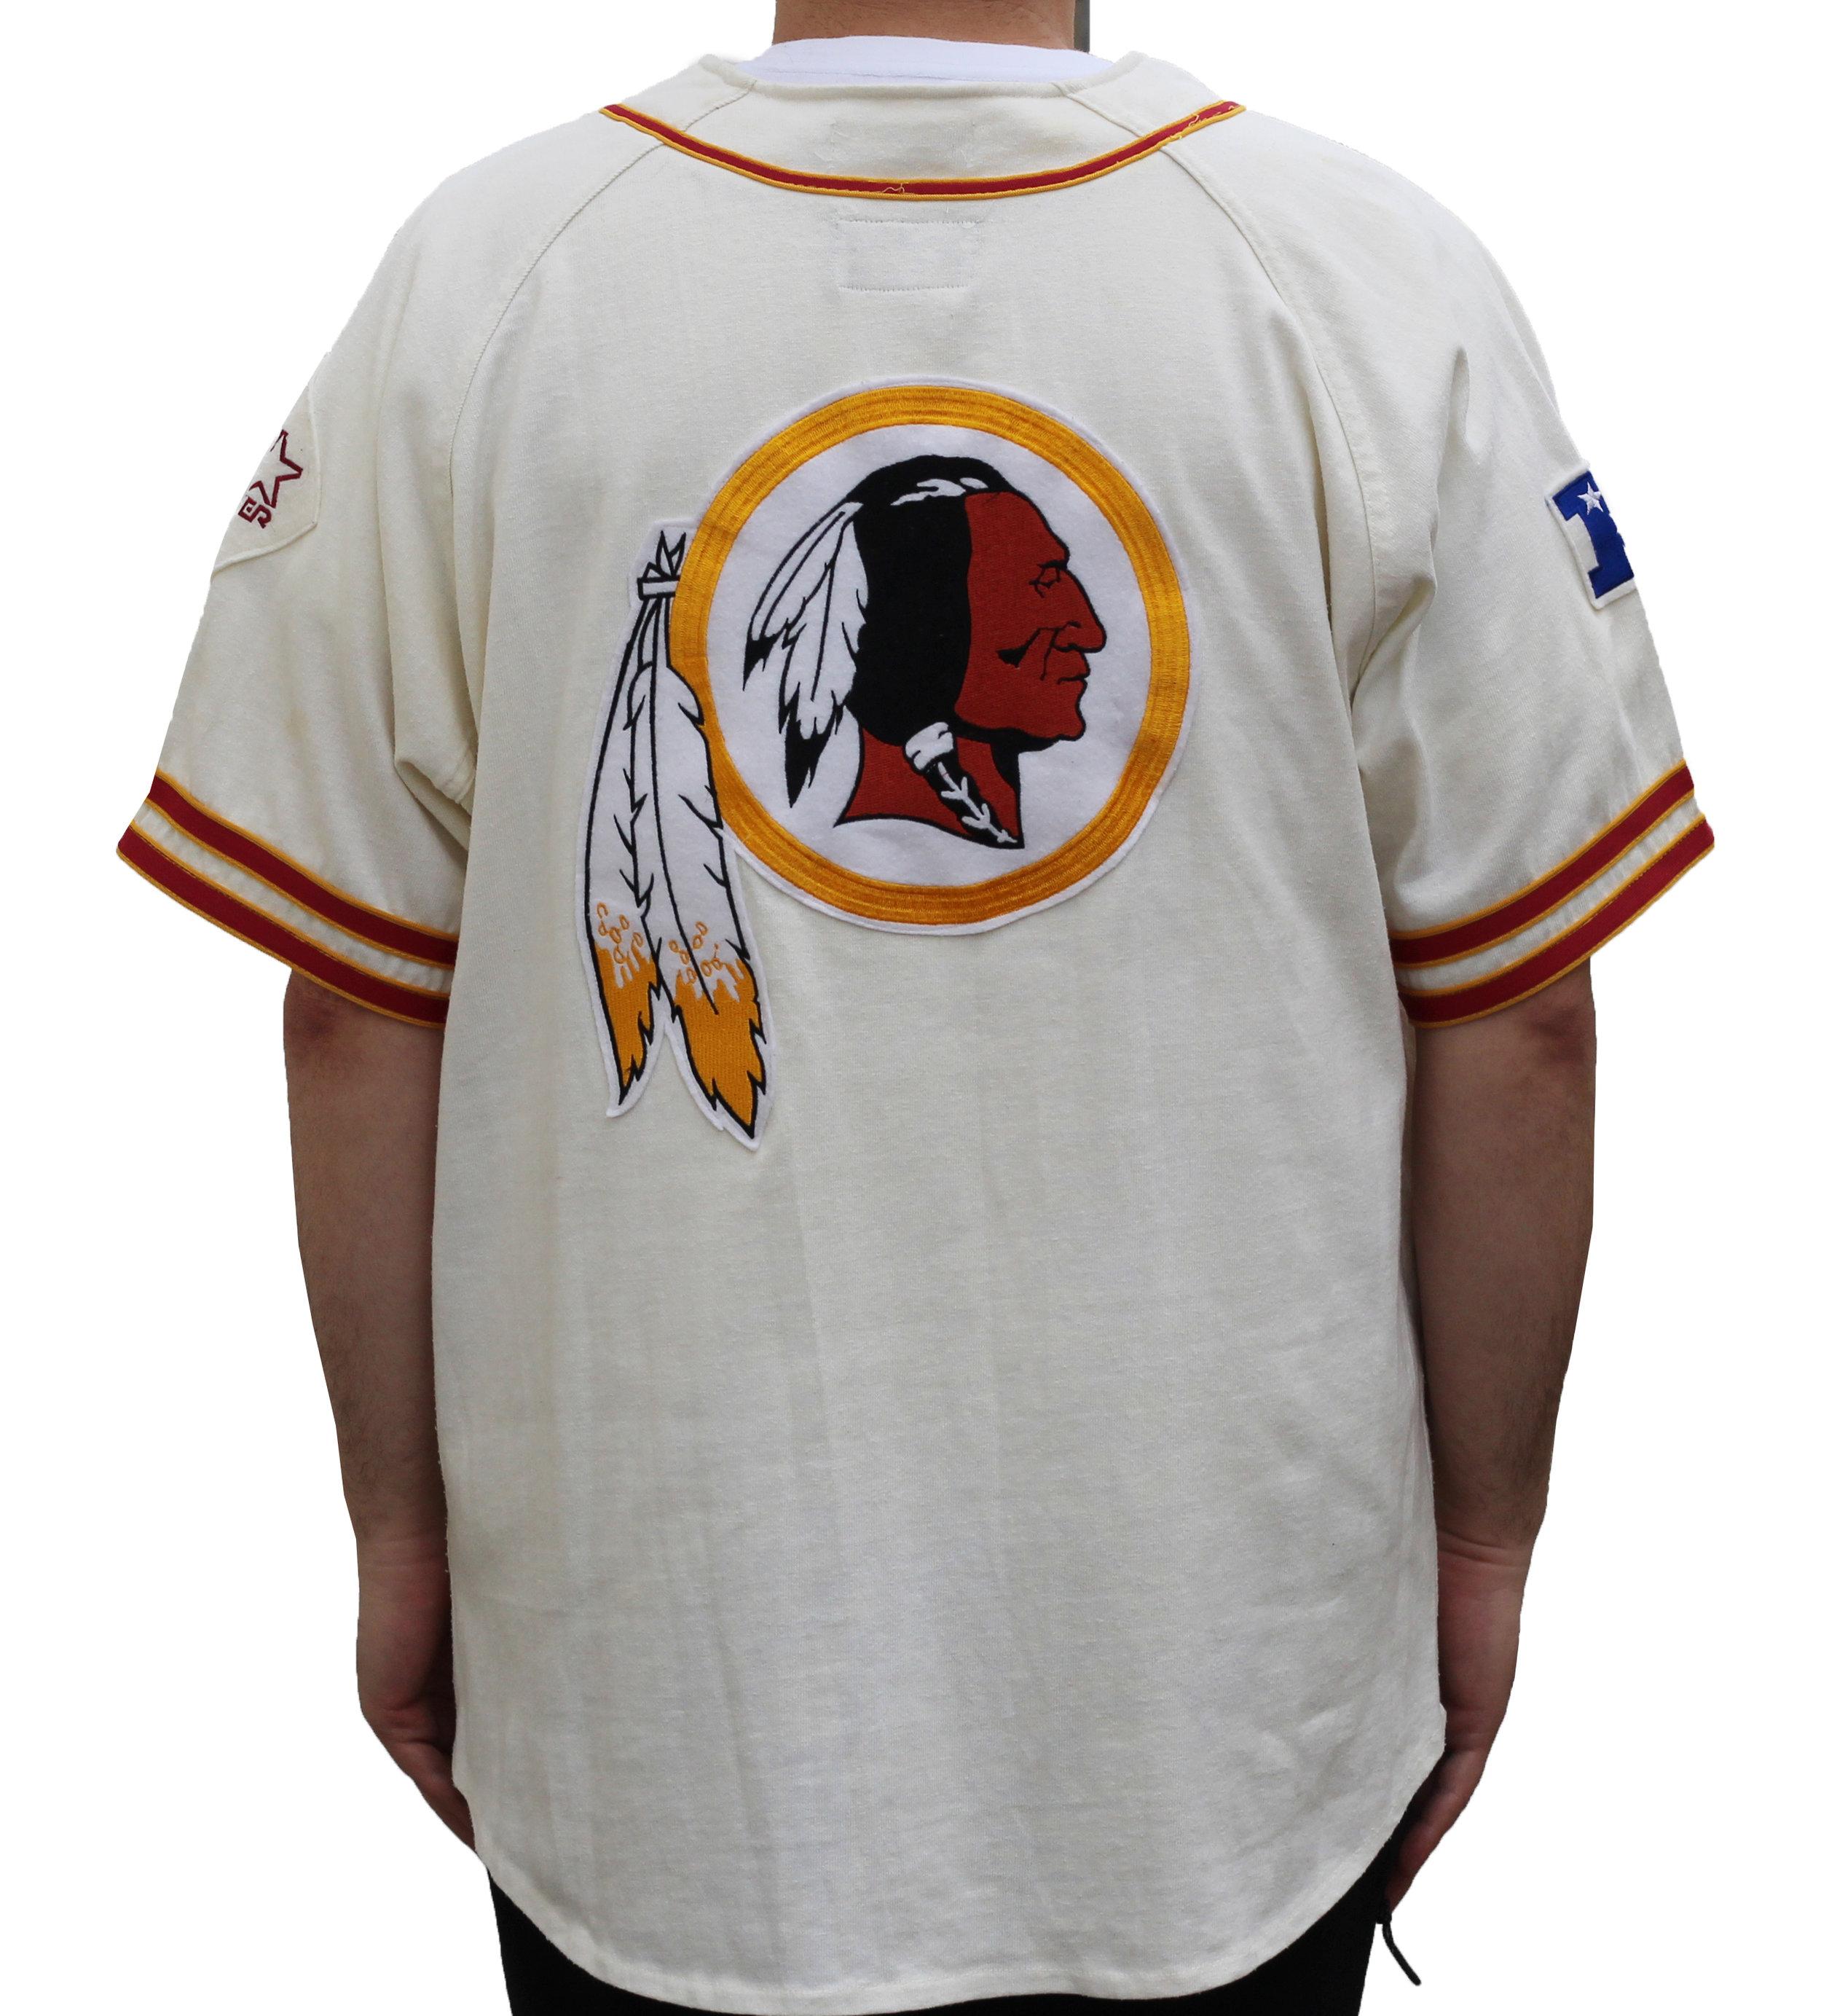 innovative design 784a0 f1a8c Vintage Starter Washington Redskins Baseball Jersey (Size L) — Roots